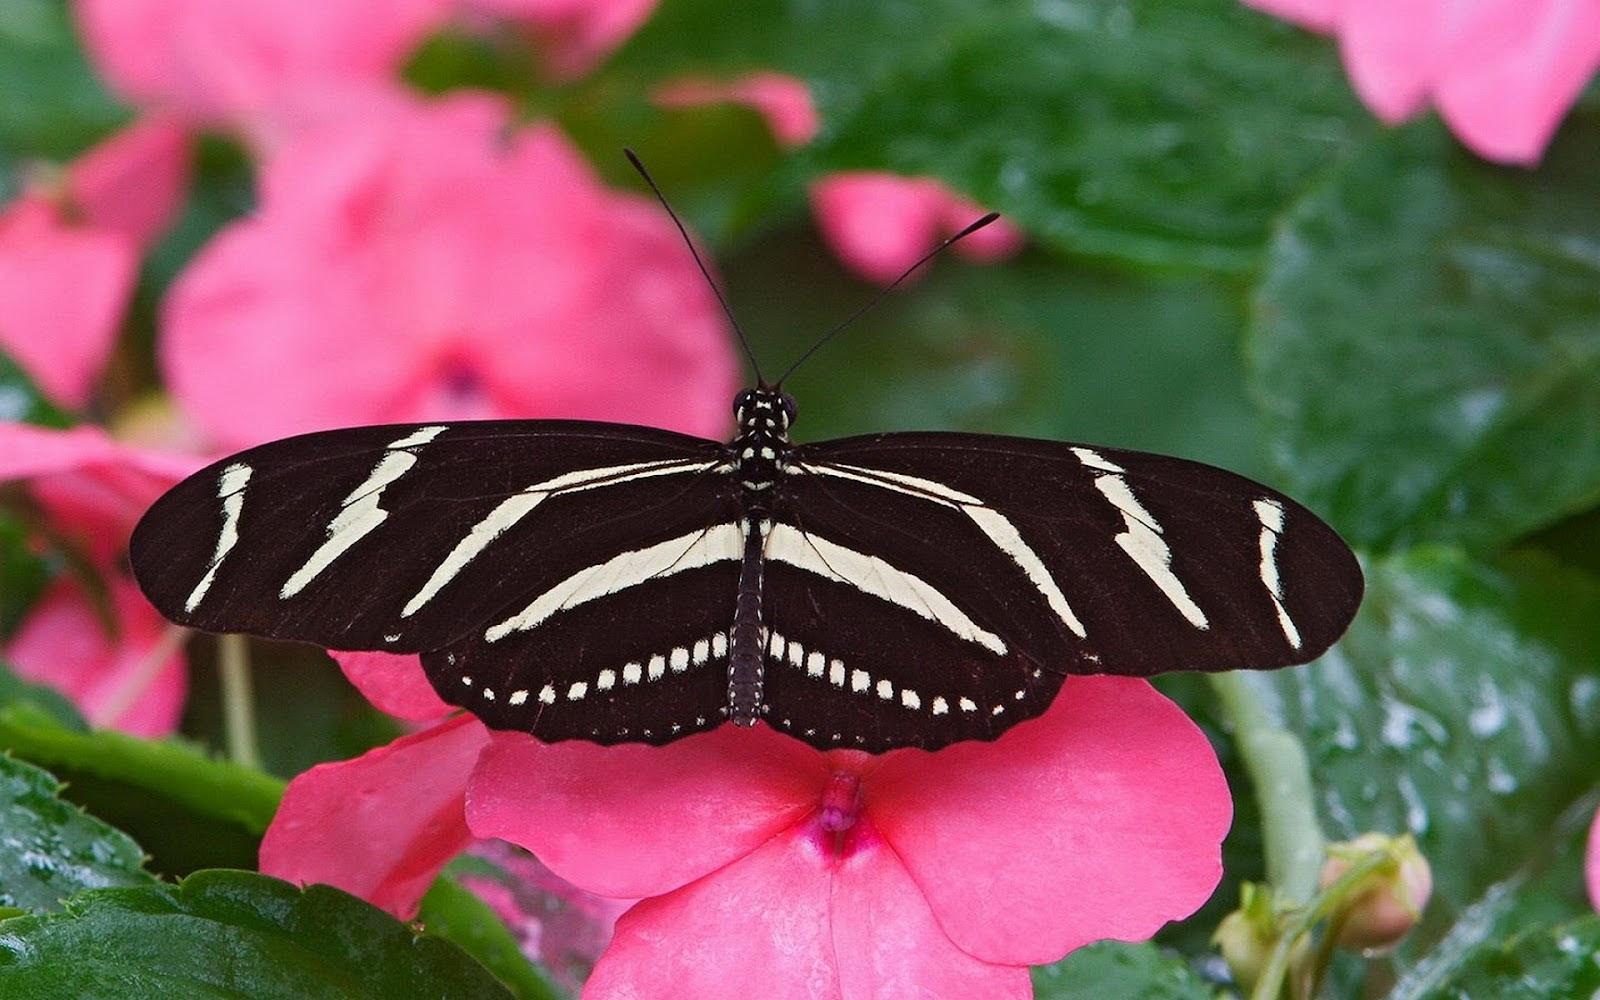 Pink Butterfly Wallpaper Flower - WallpaperSafari